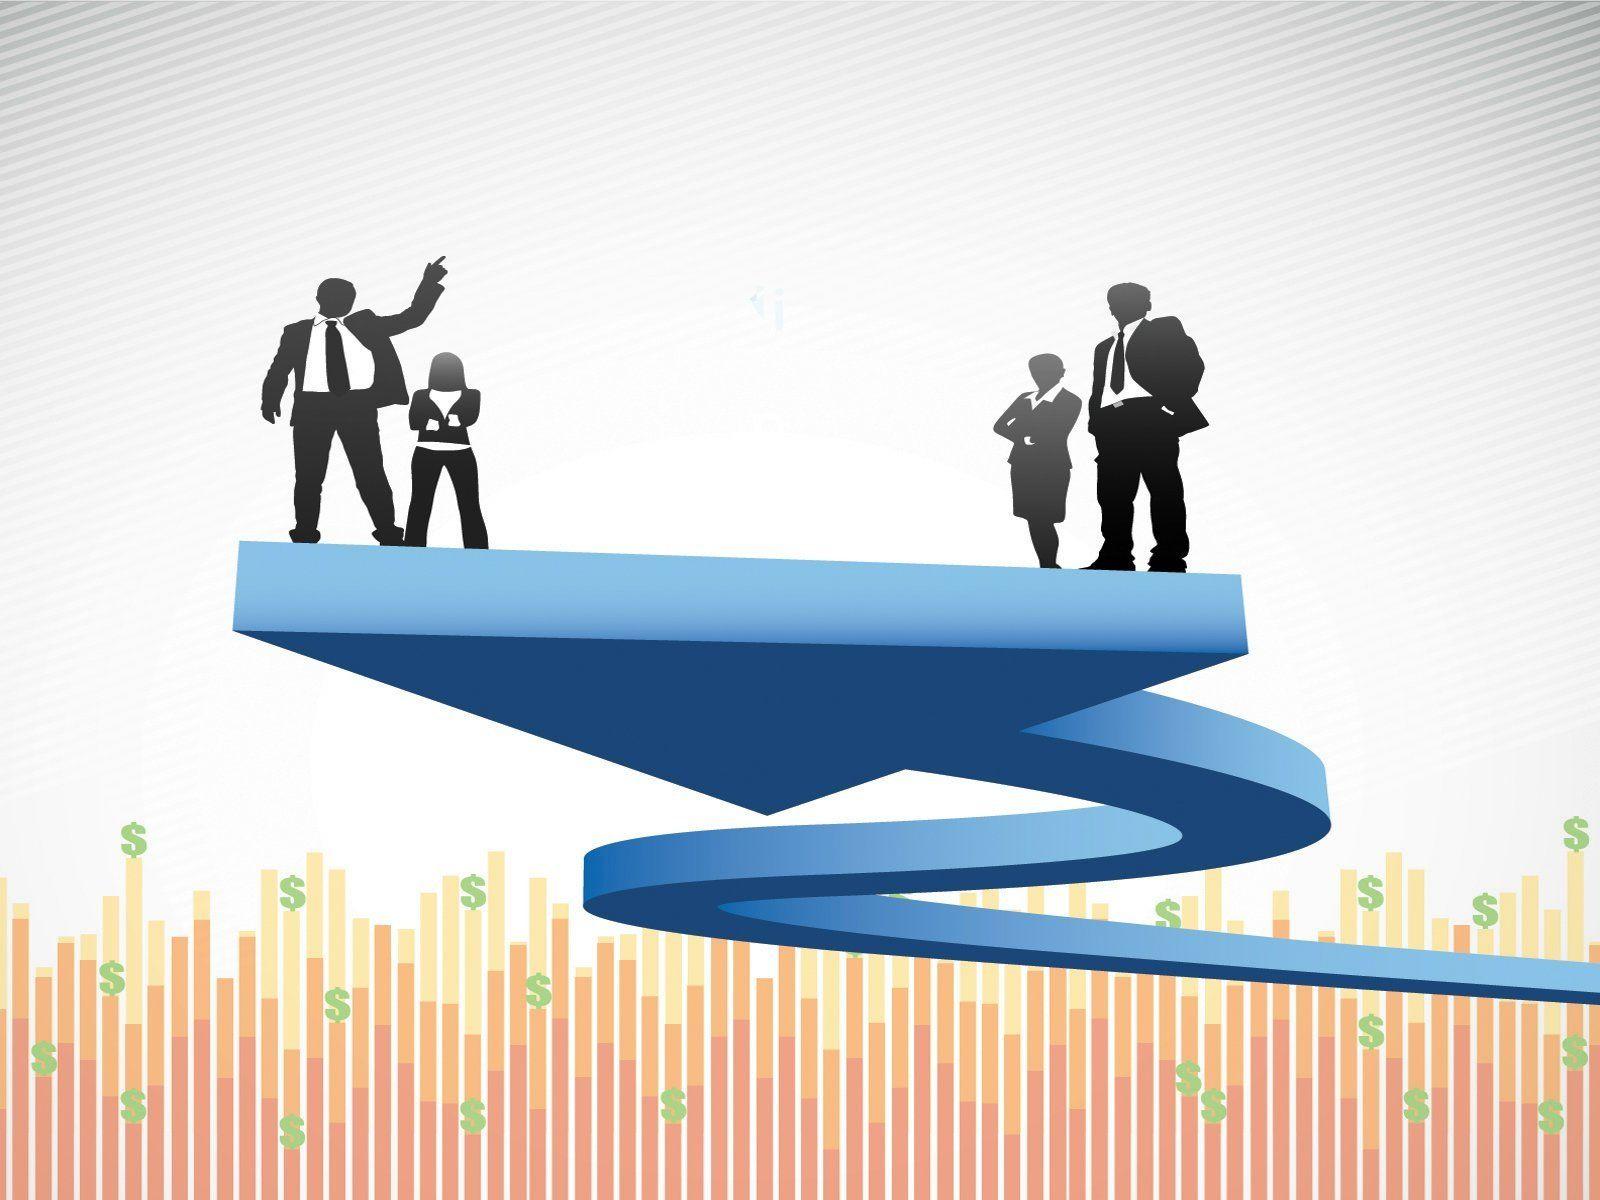 finance-arrow-powerpoint-templates-finance